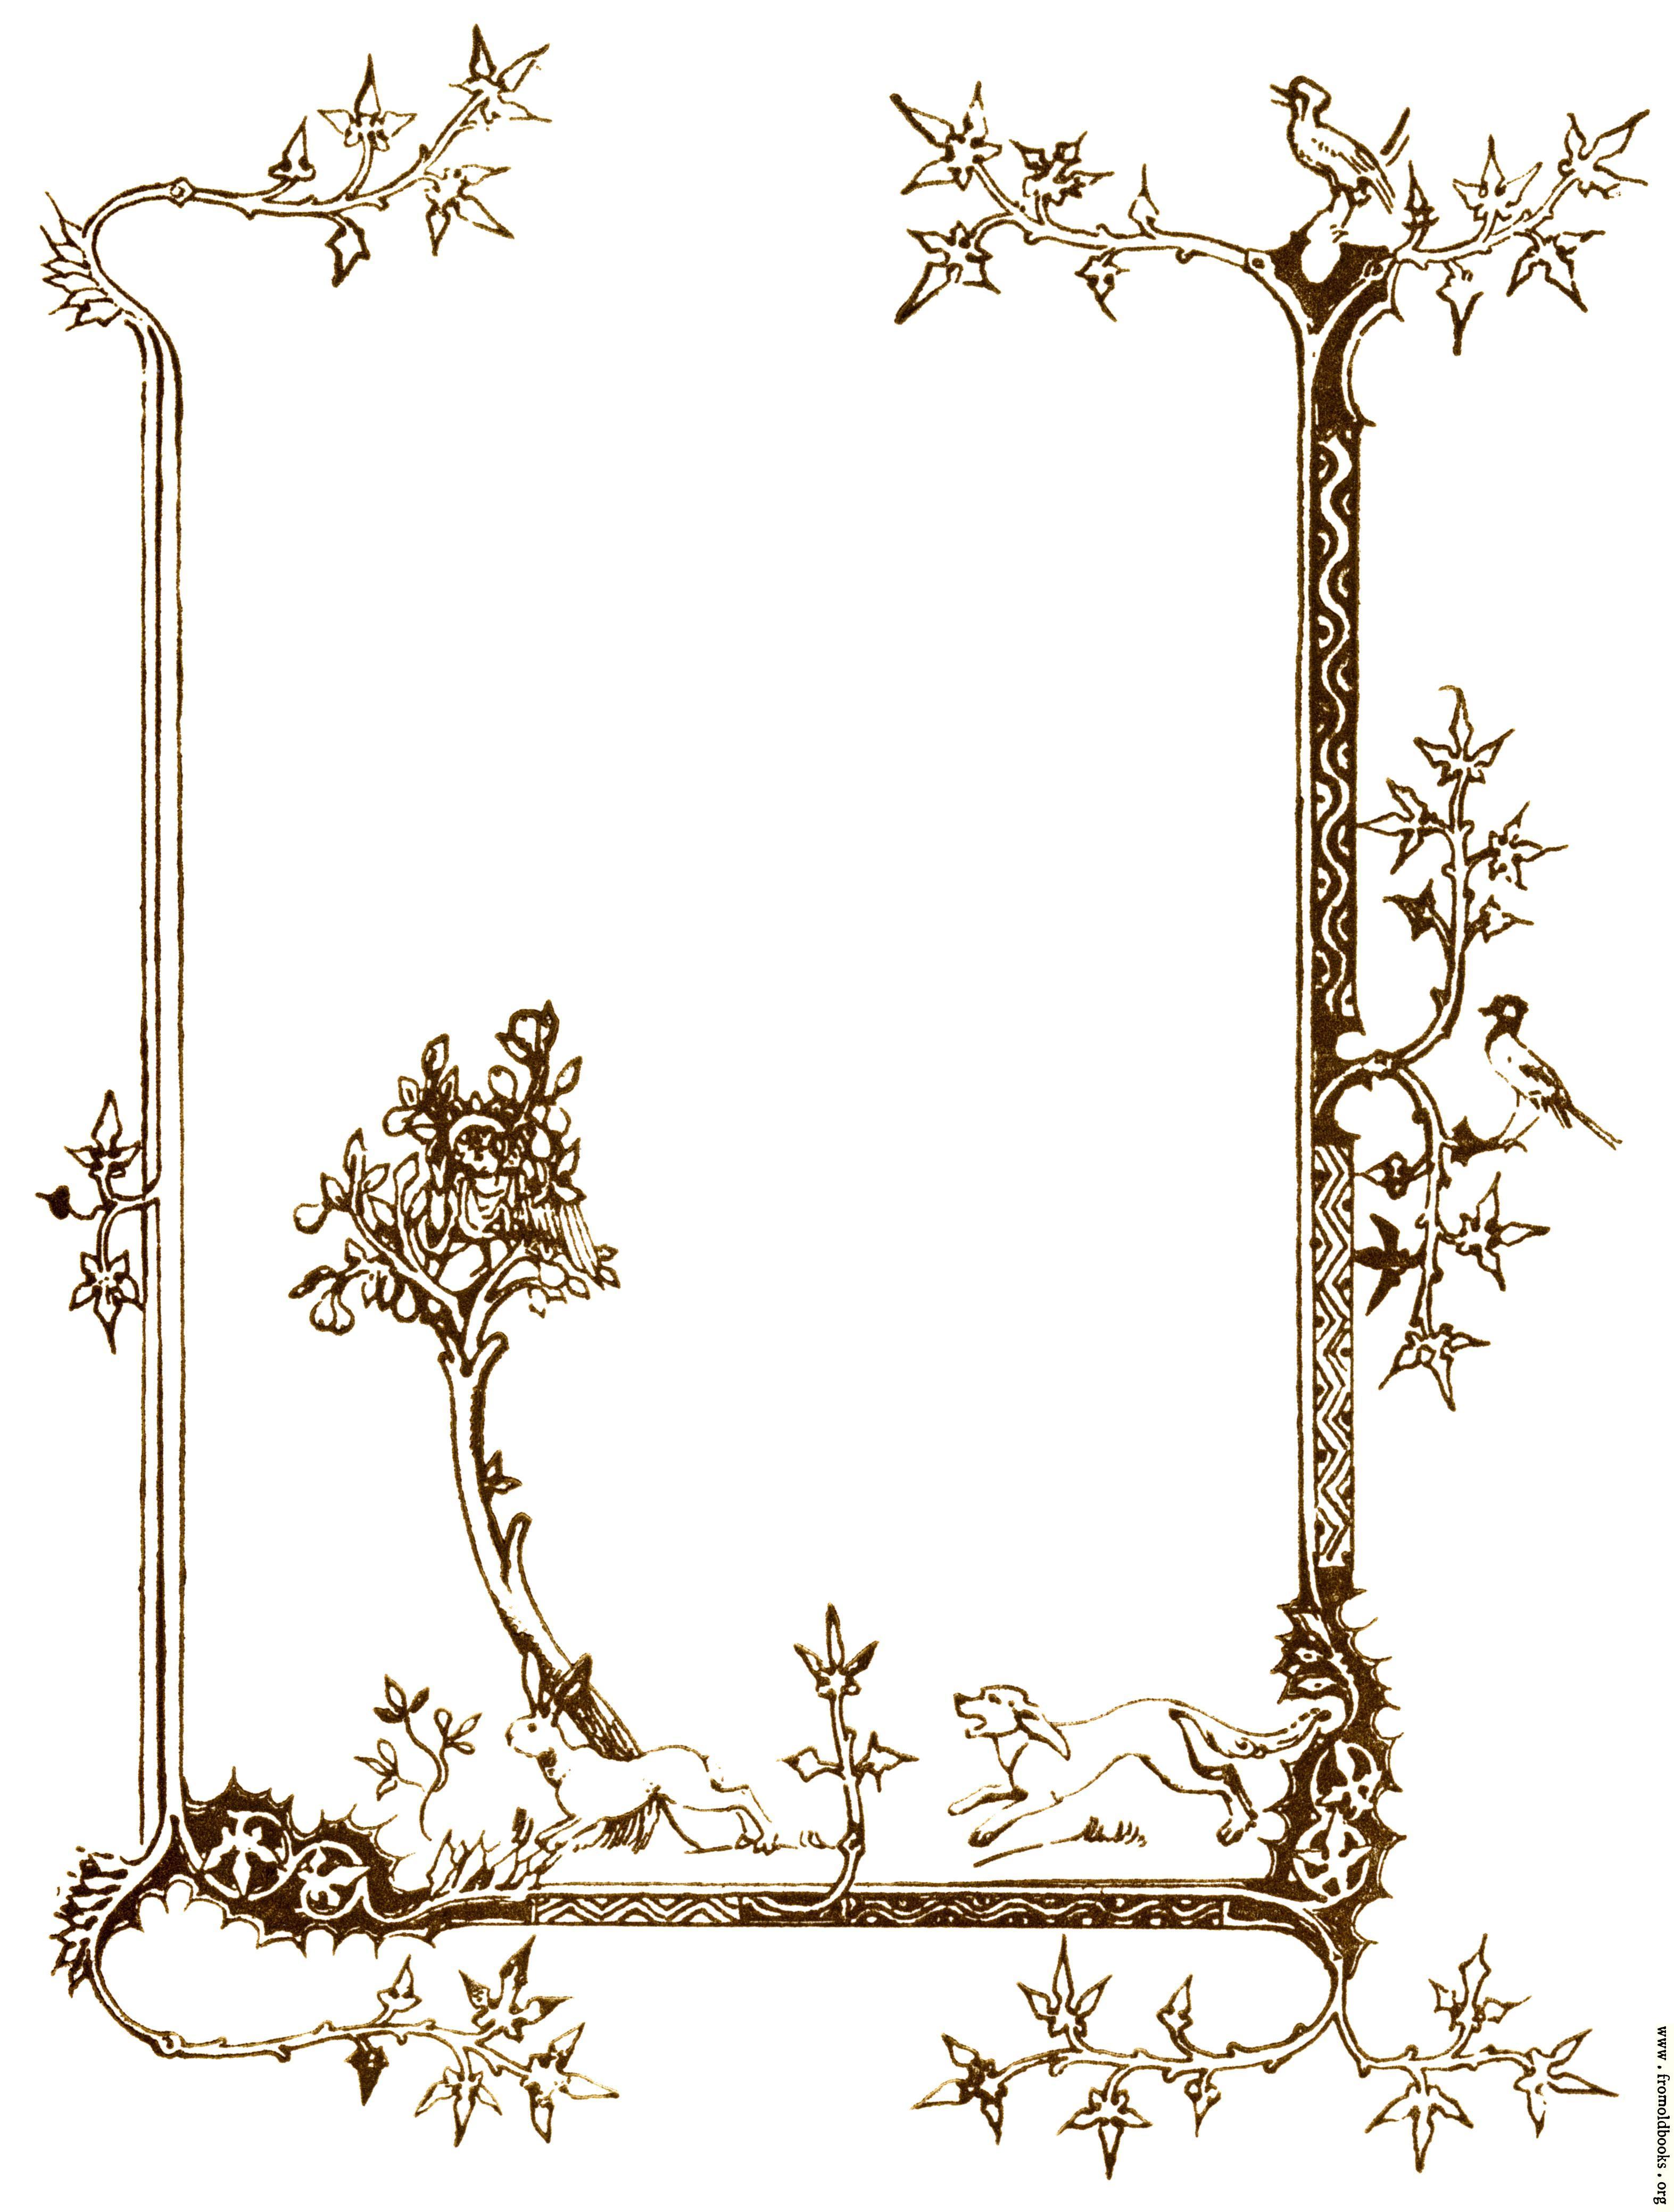 download leaving parnassus: the lyric subject in verlaine and rimbaud.